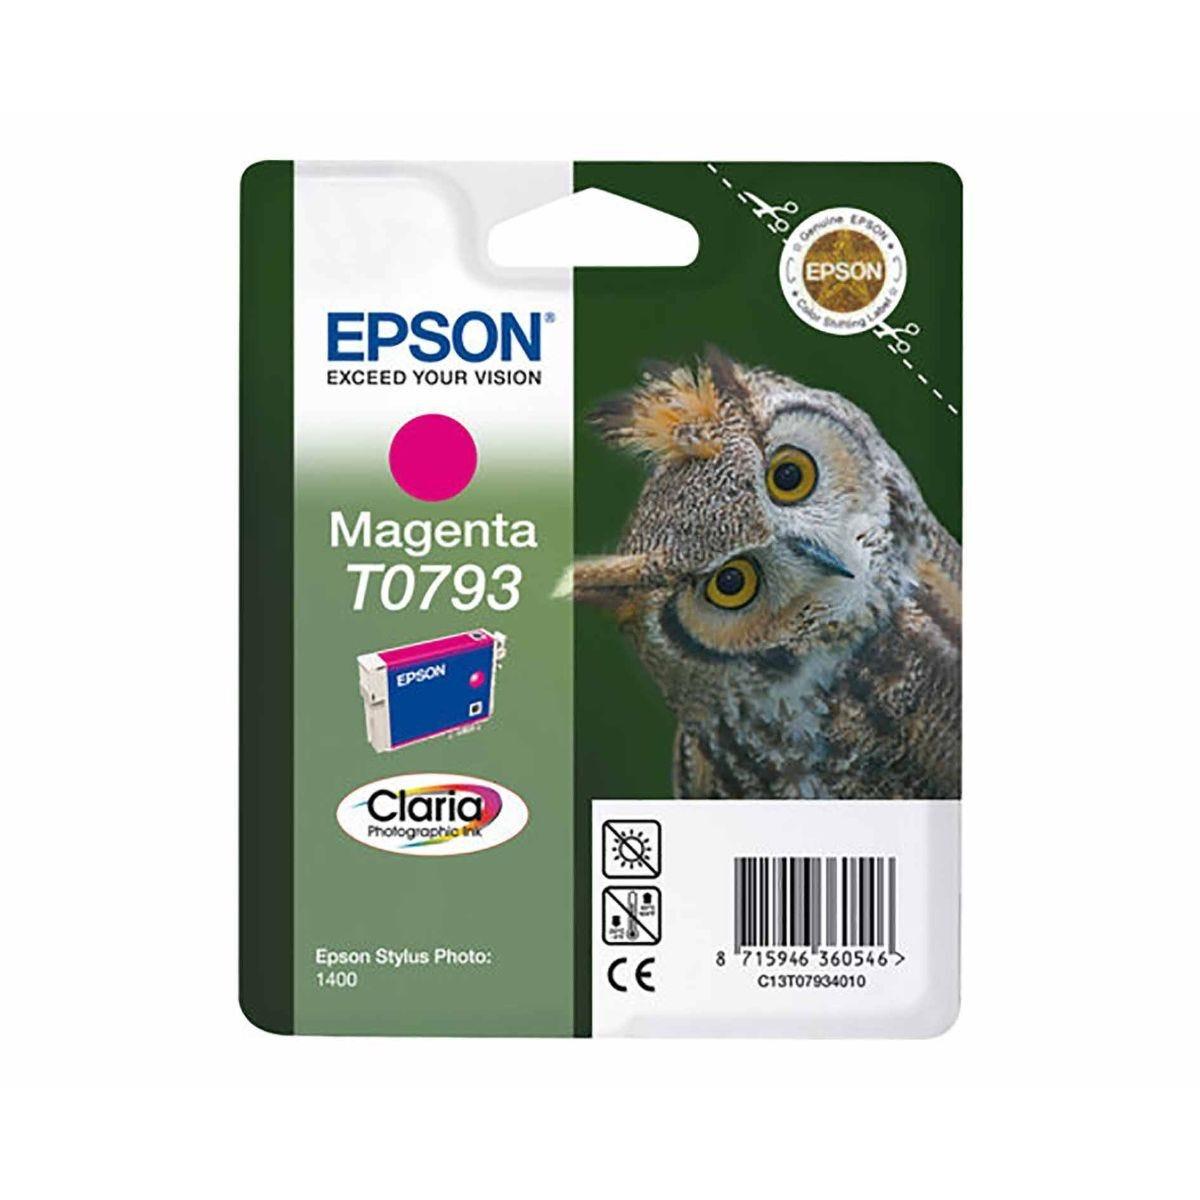 Epson T0793 Ink Cartridge